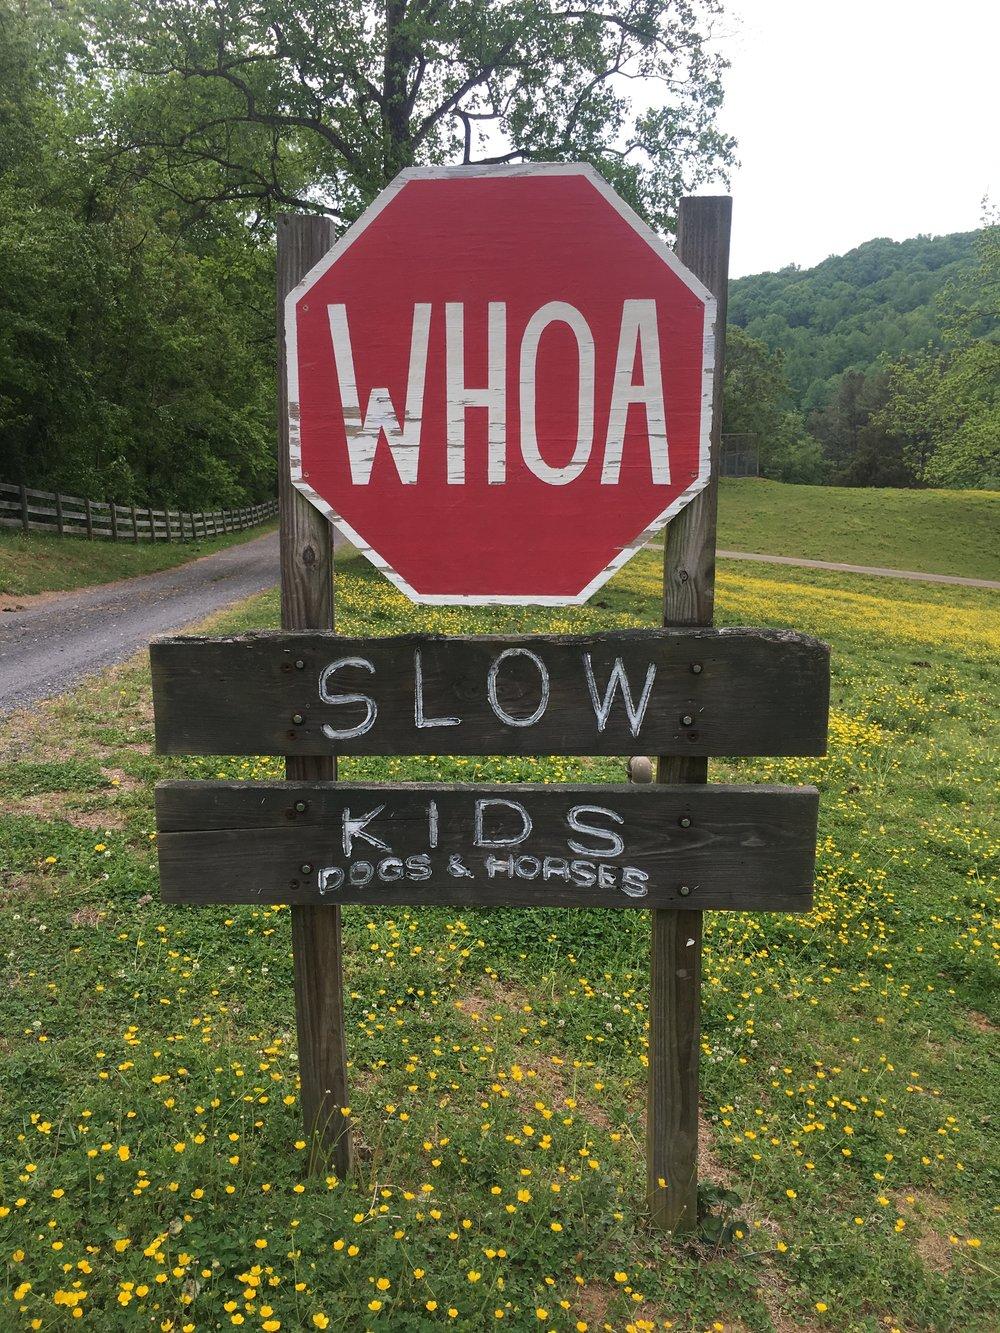 whoa slow kids sign.JPG